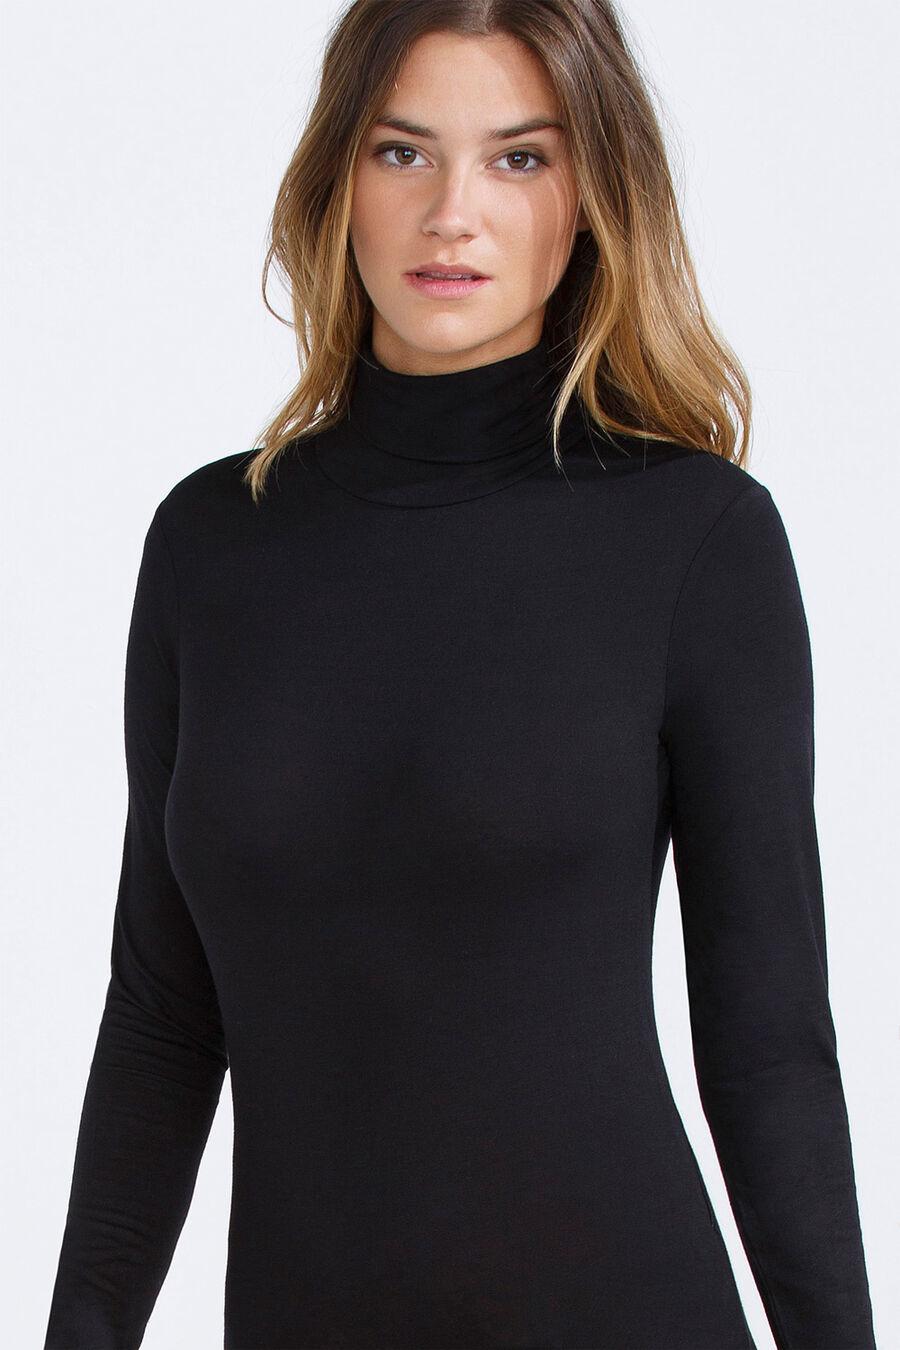 Spandex long-sleeve bodysuit